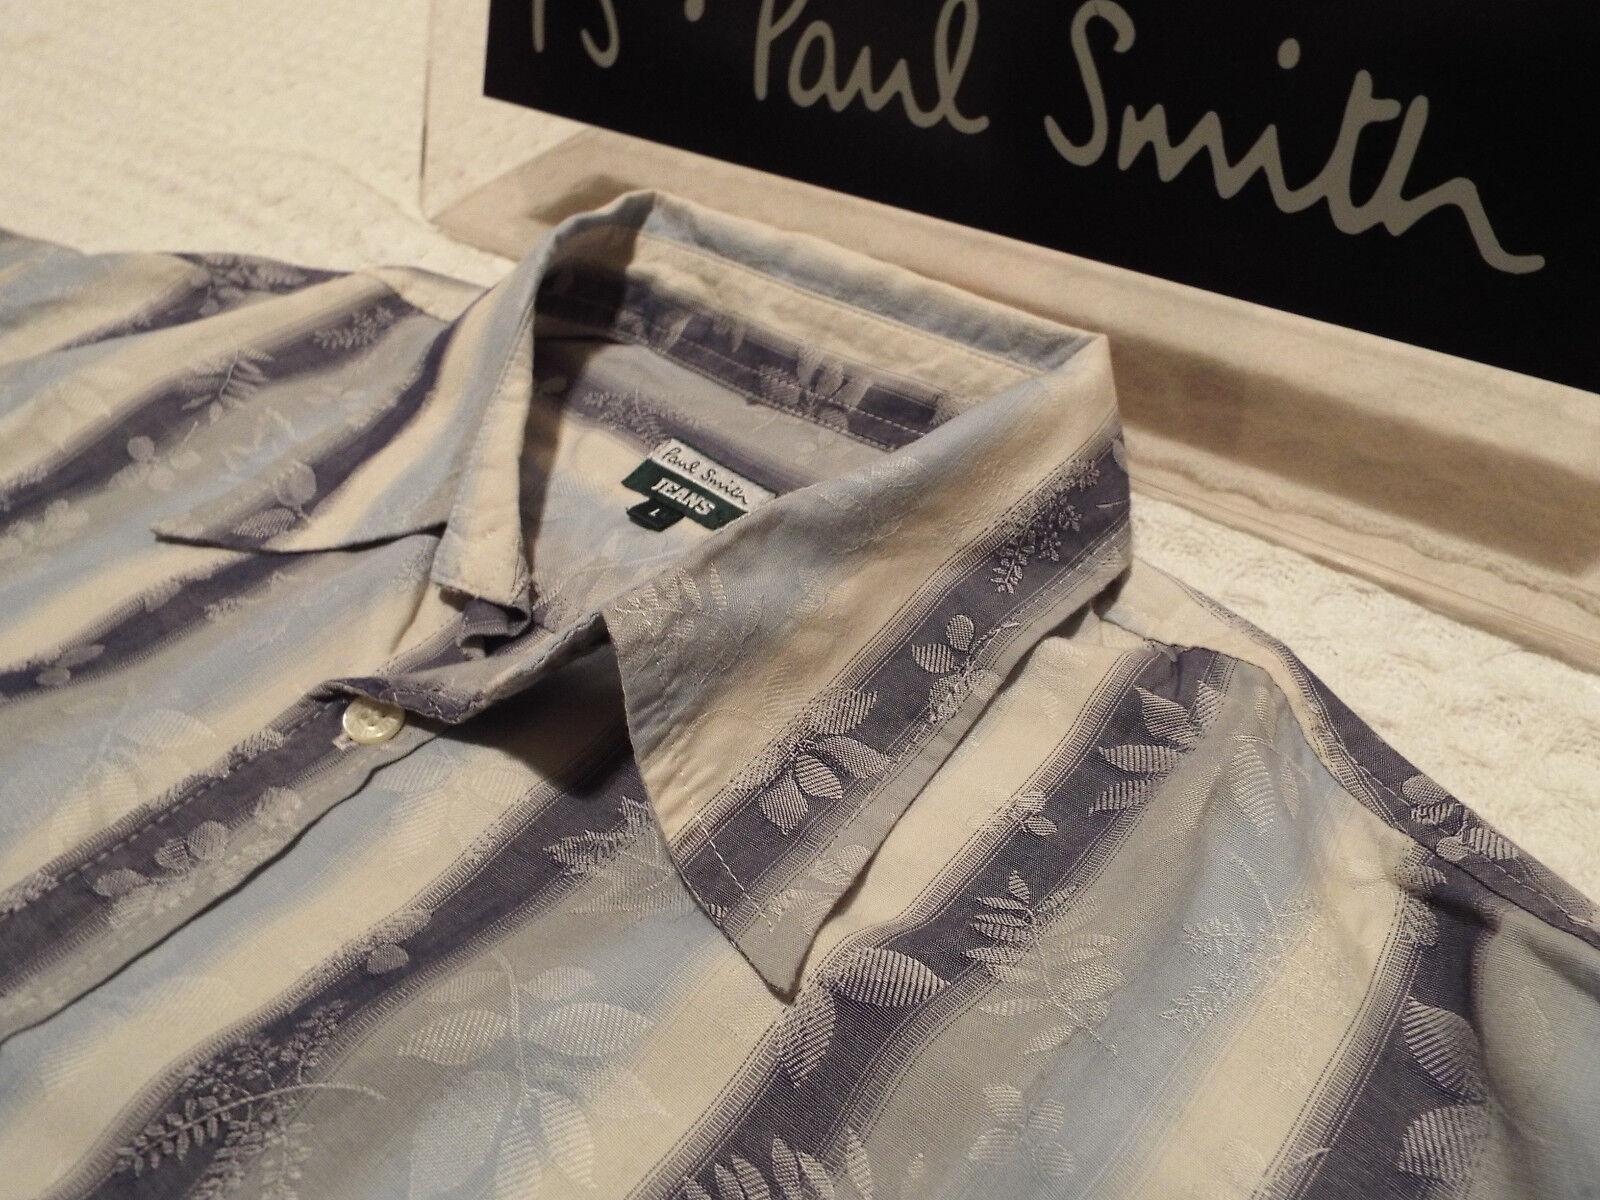 7f16a42f54d PAUL SMITH Shirt Size L (CHEST 42 ) RRP FLORAL JACQUARD STRIPE + Mens  nejdlw2546-Casual Shirts   Tops